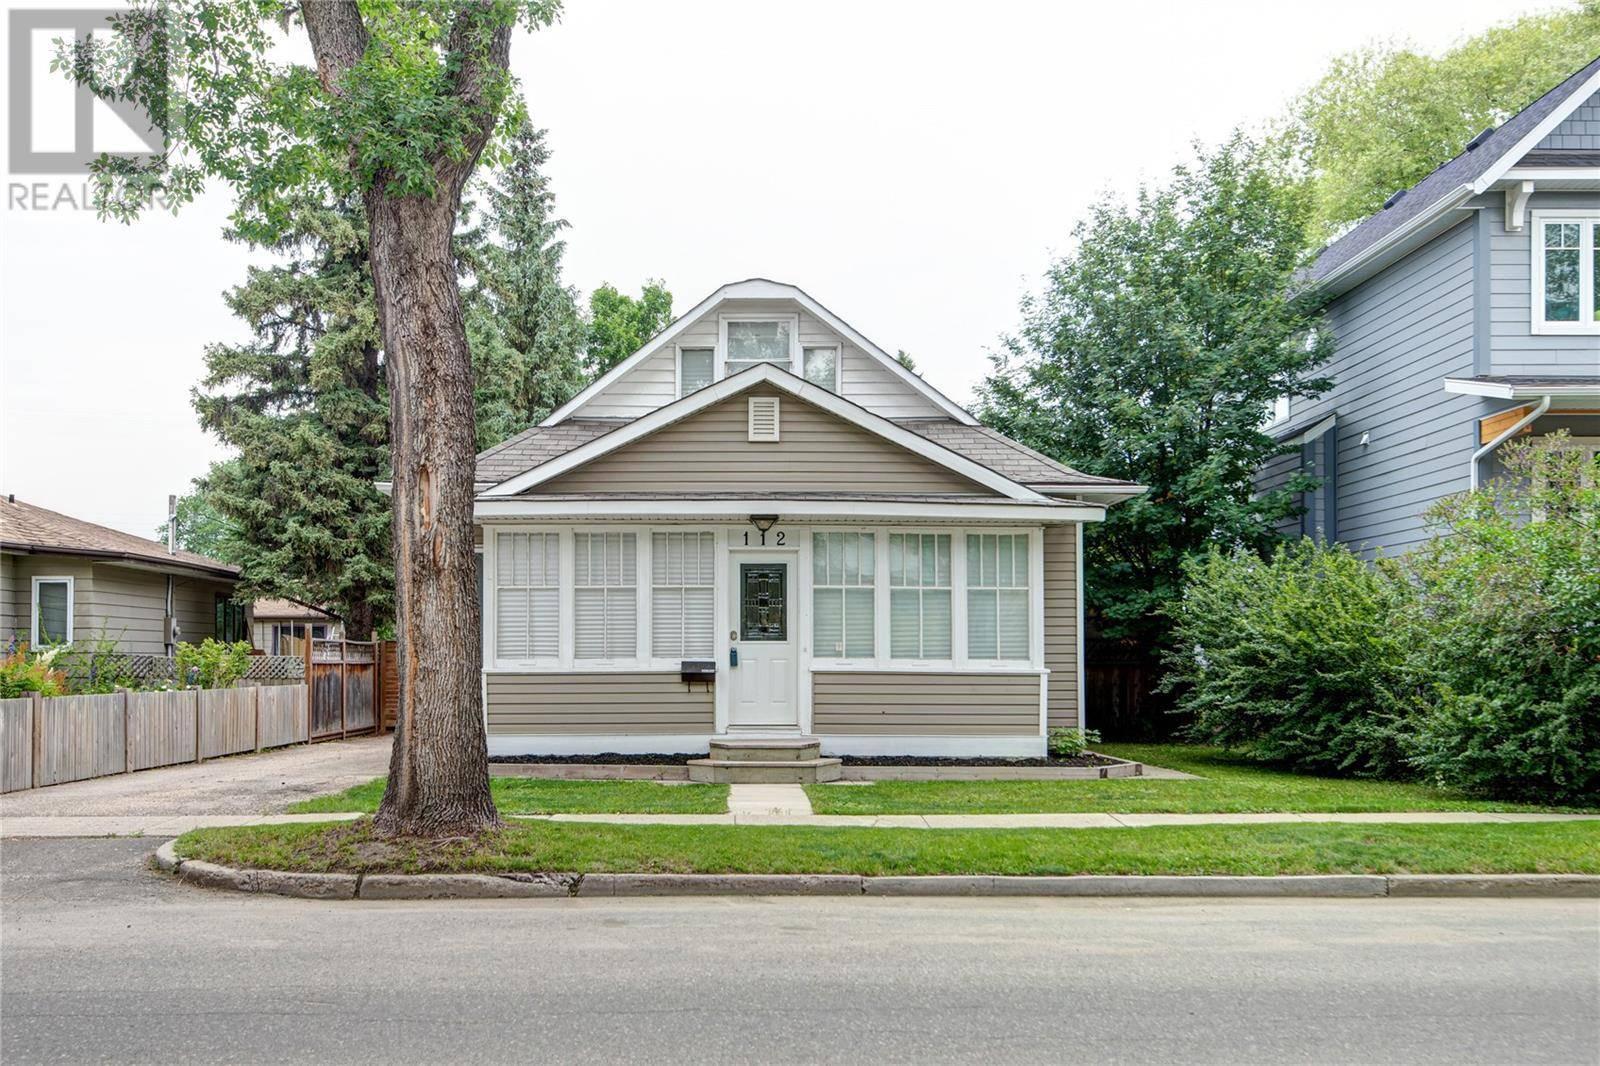 House for sale at 112 112th St W Saskatoon Saskatchewan - MLS: SK779722